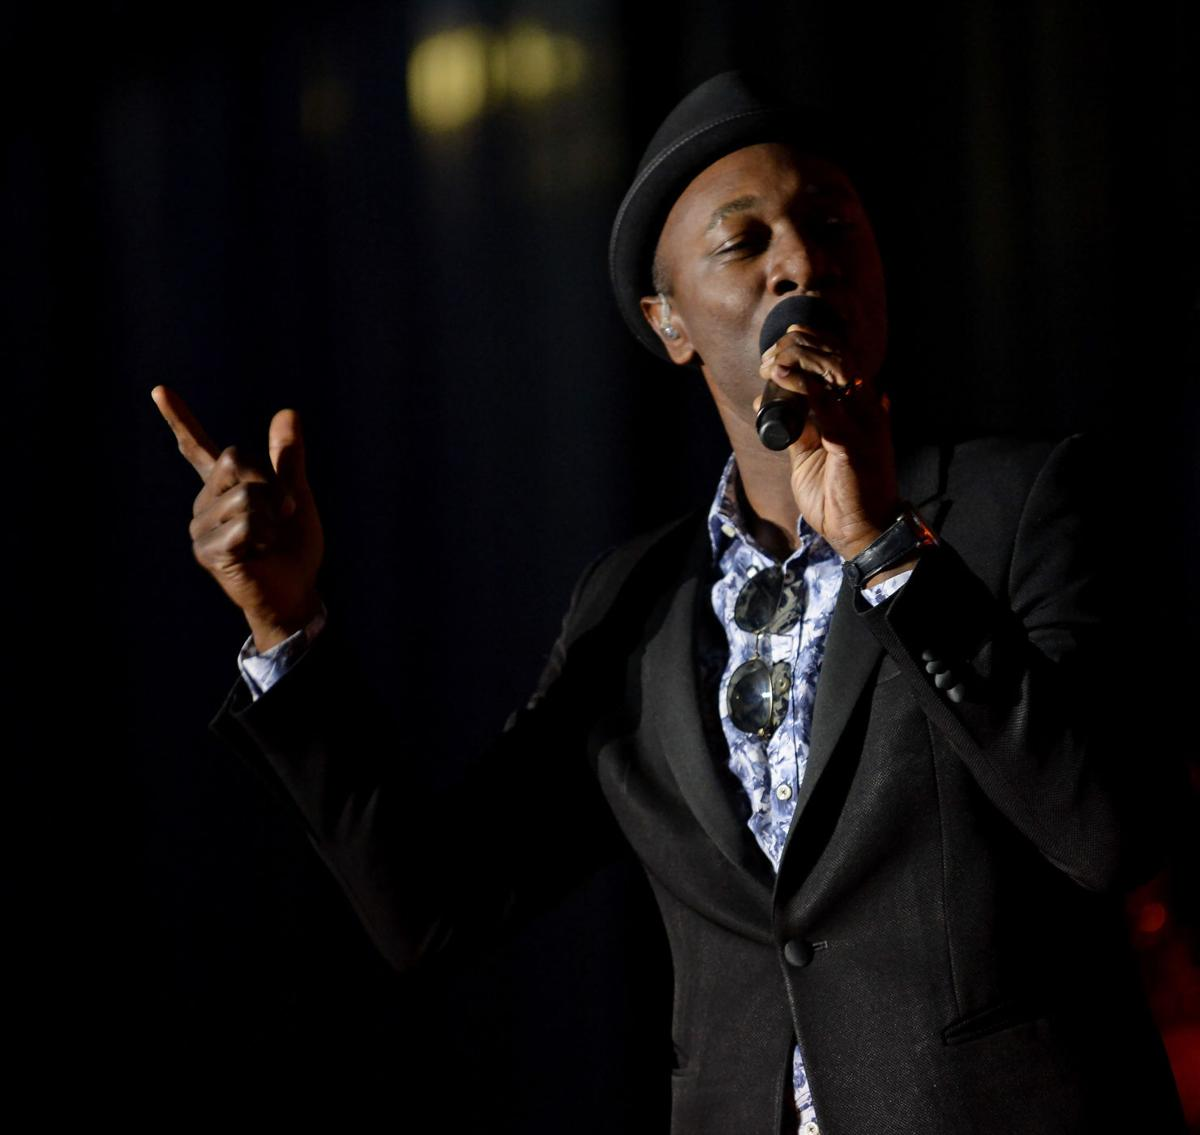 2019 New Orleans Jazz Festival Adds John Prine, Aloe Blacc